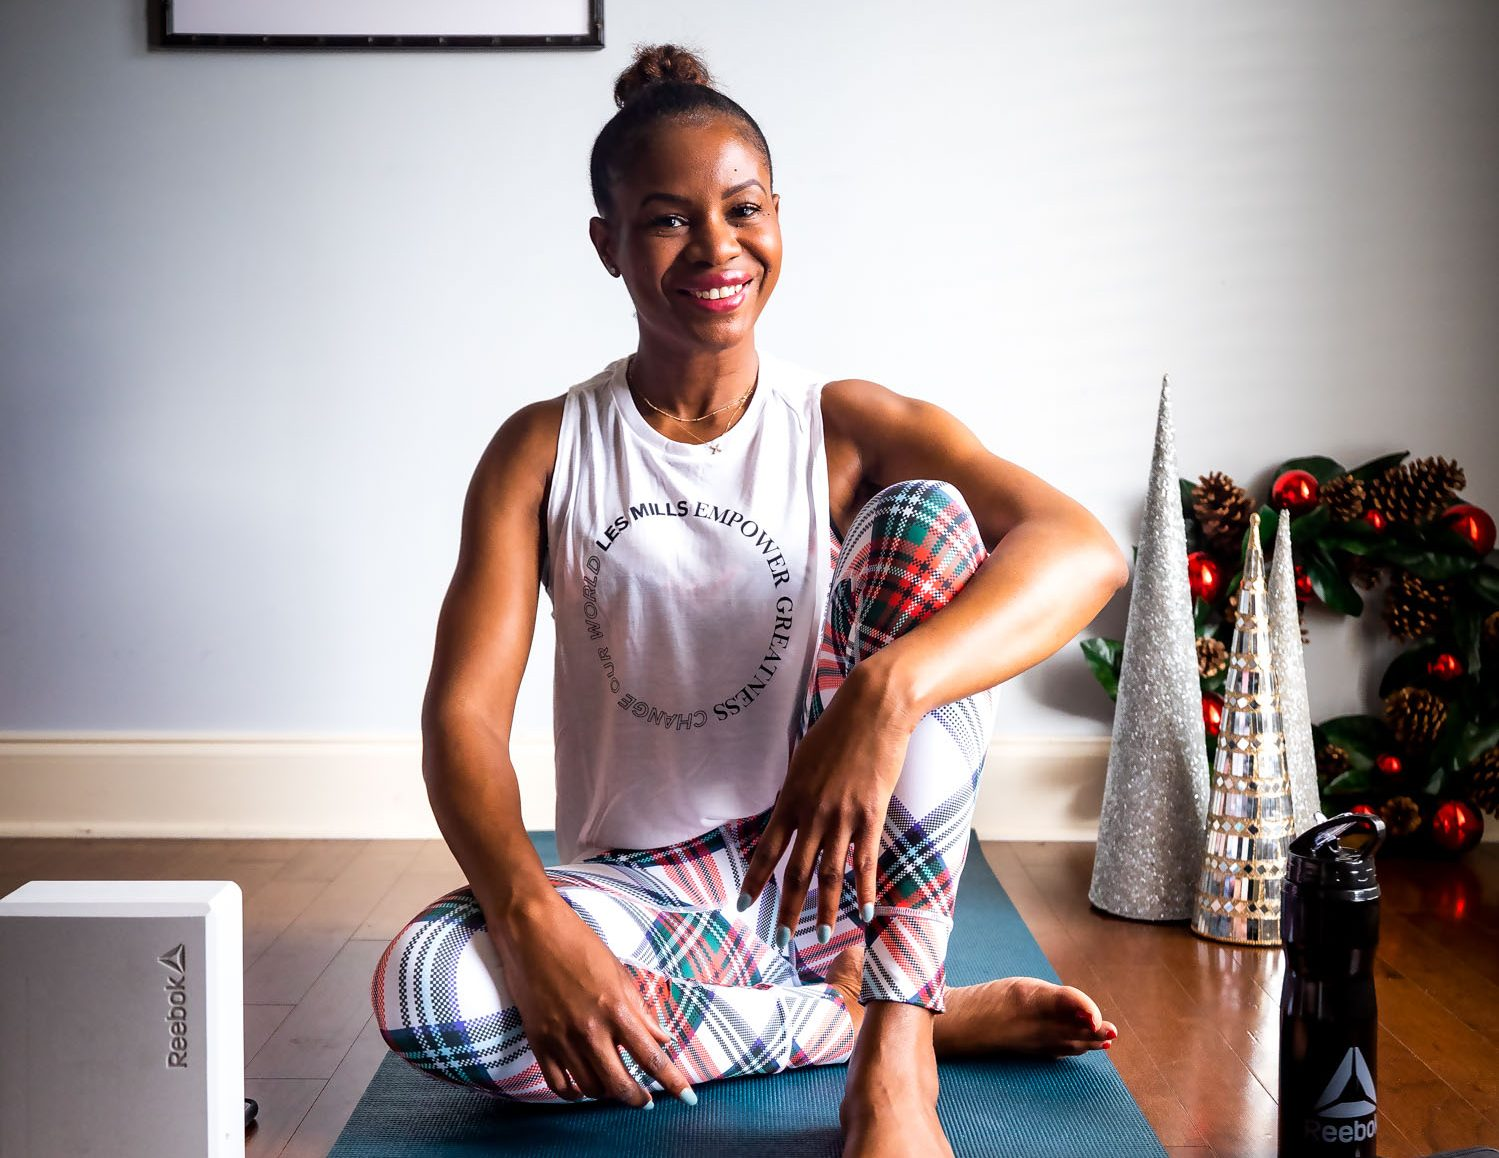 How Atlanta lifestyle blogger Monica Awe-Etuk will achieve minimum stress during the holidays. wearing reebok plaid leggings, and sports bra. Reebok yoga mat, yoga block and reebok water bottle for the holiday